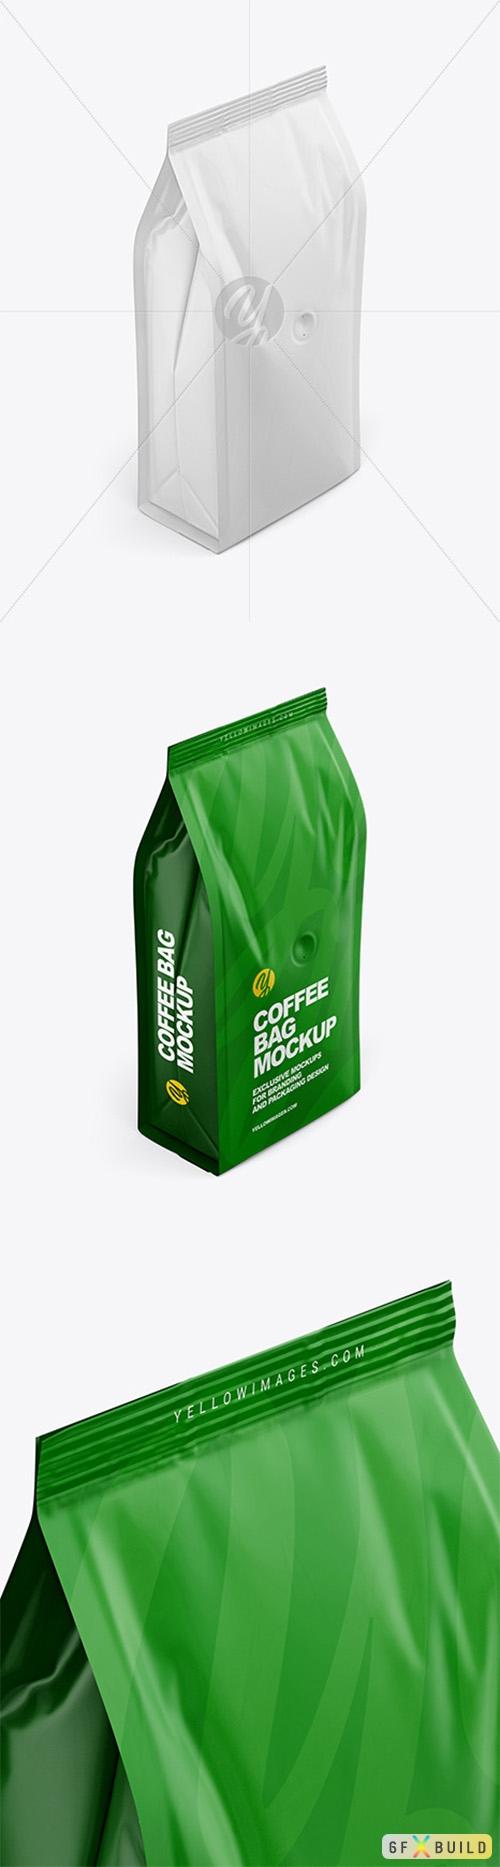 Matte Coffee Bag Mockup - Half Side View 62835 TIF